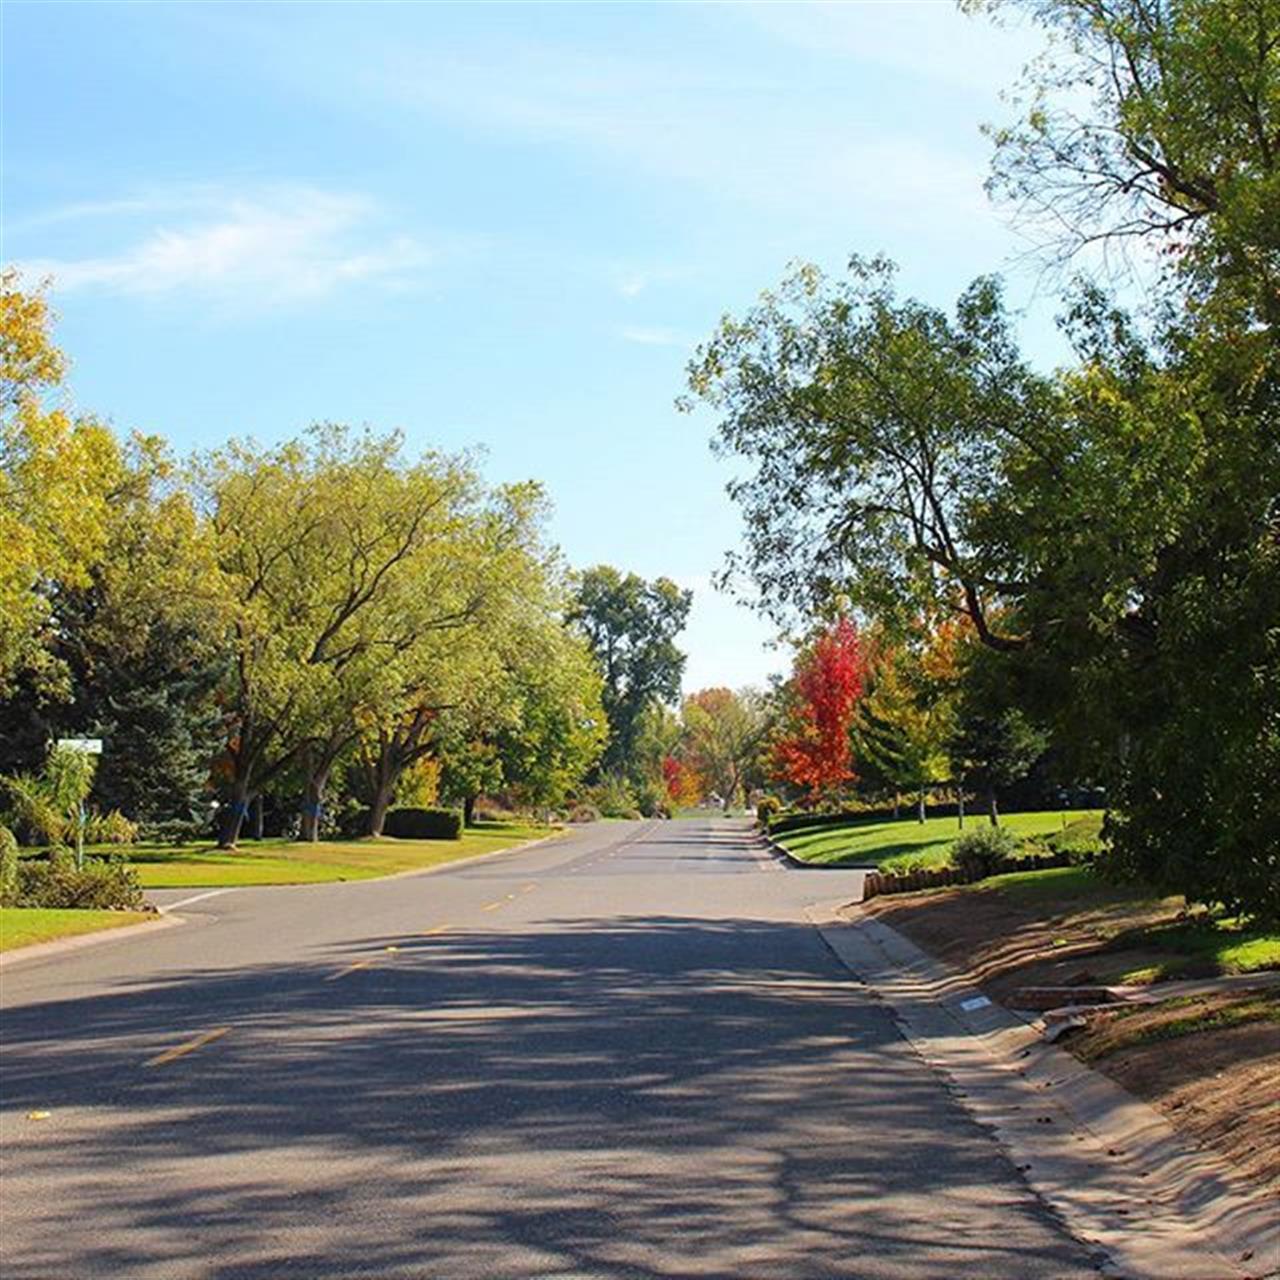 Beautiful tree-lined streets of Arden Park. #lyonrealestate #leadingrelocal #sacramento #ardenpark